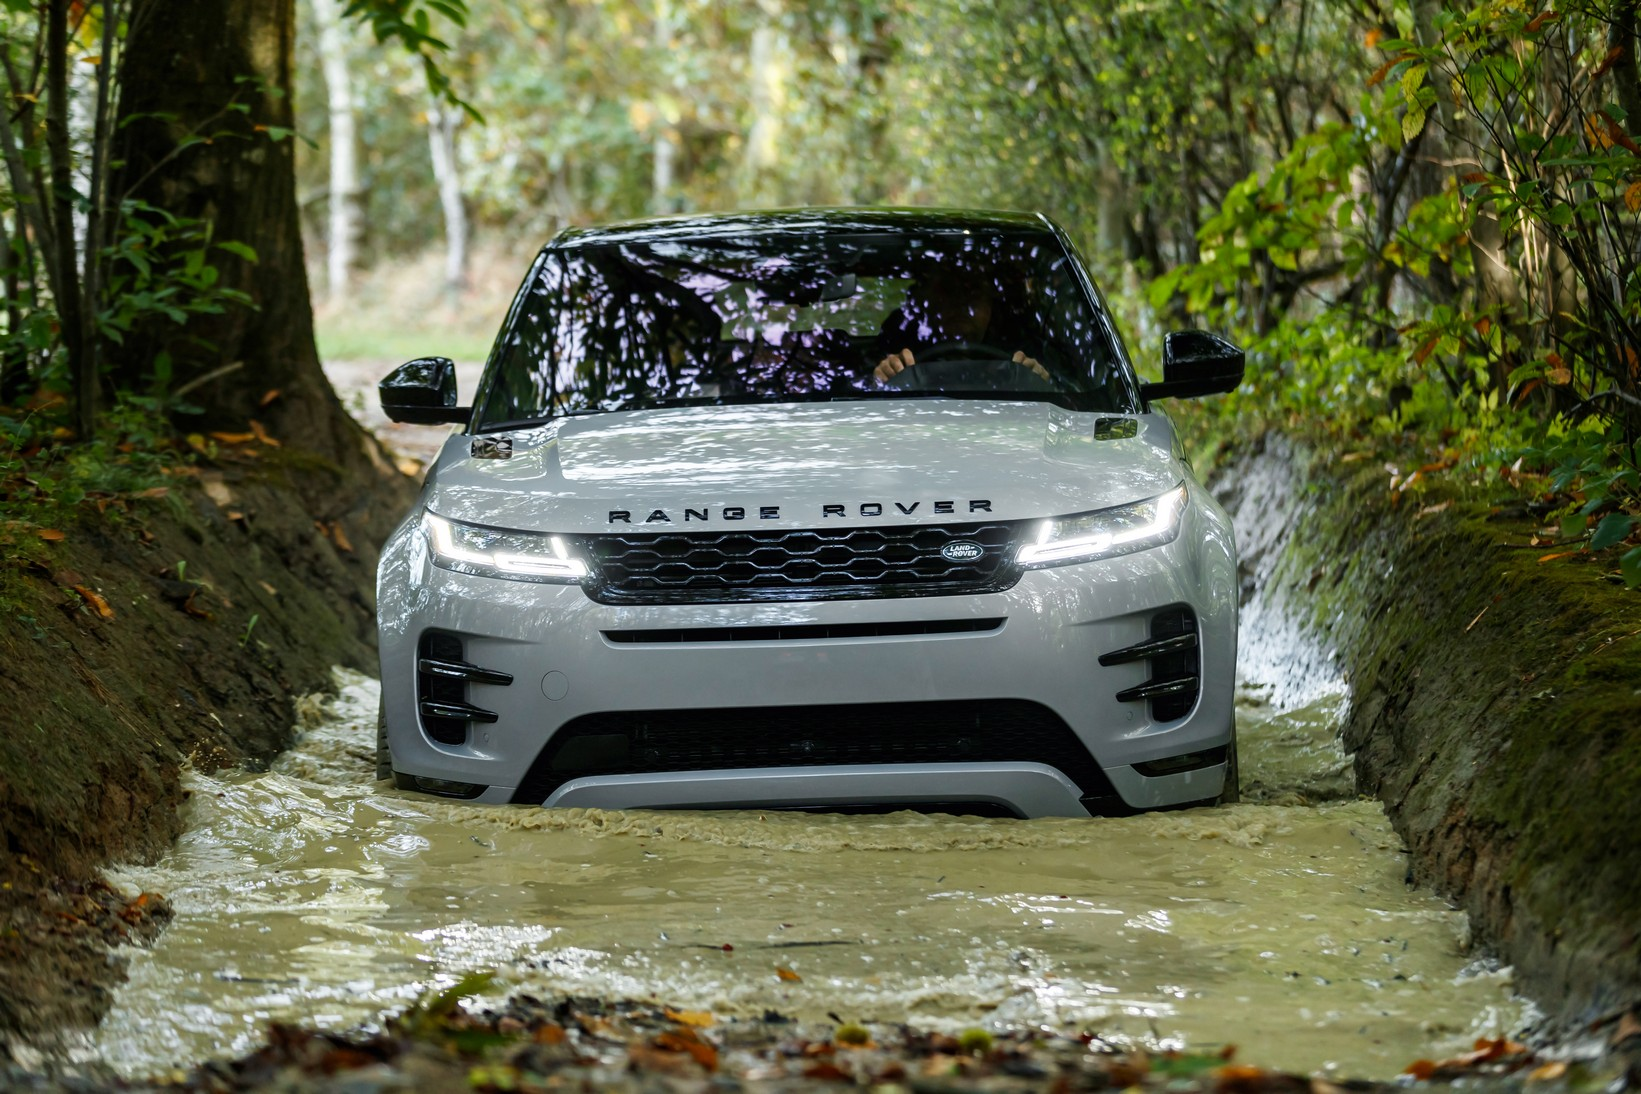 Land Rover Range Rover Evoque 2.0 D180 SE 5dr Auto image 2